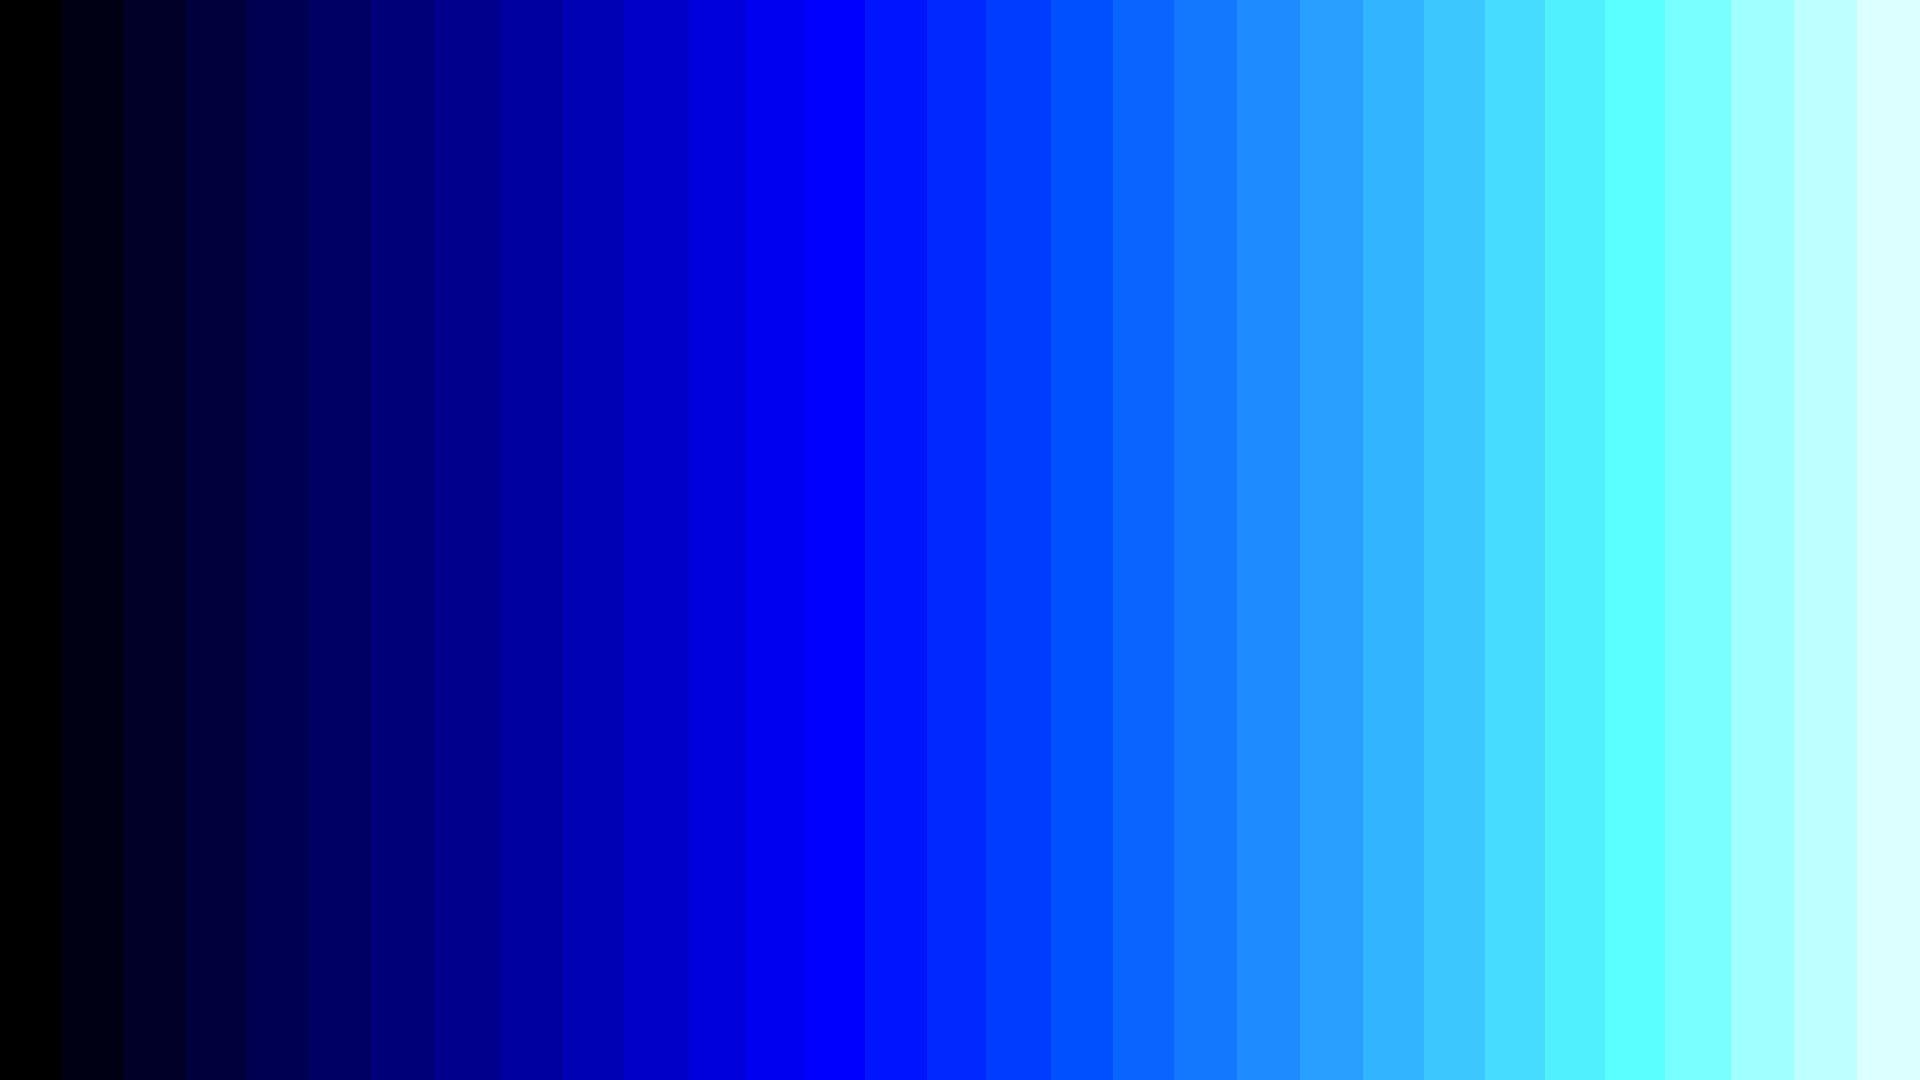 Blue Color Wallpaper 5 24357 for Your Desktop Wallpaper